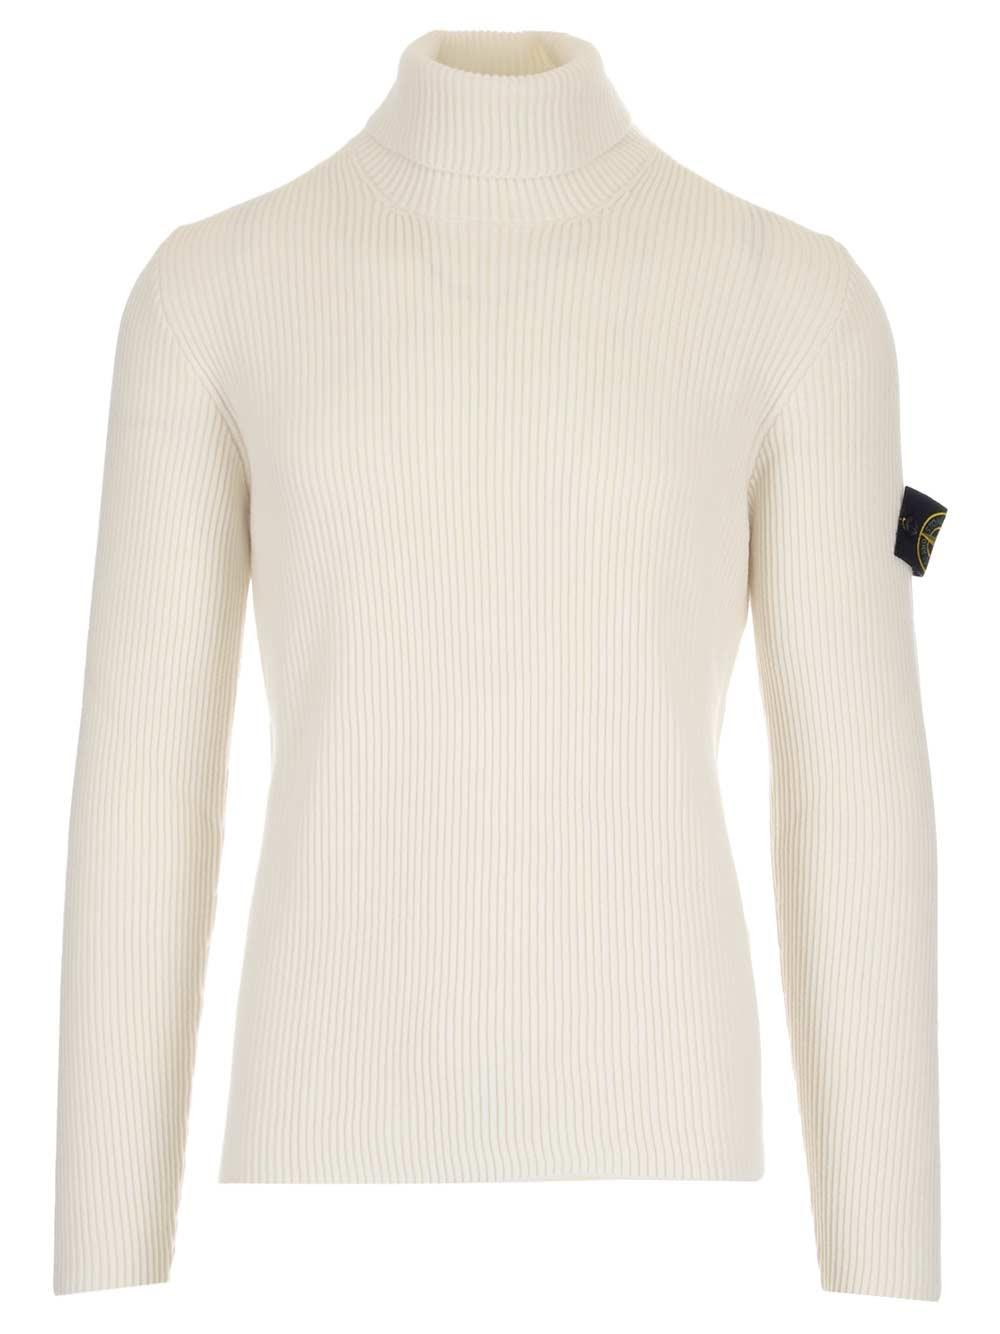 Stone Island Ribbed Wool Sweater For Men Us Al Duca D Aosta